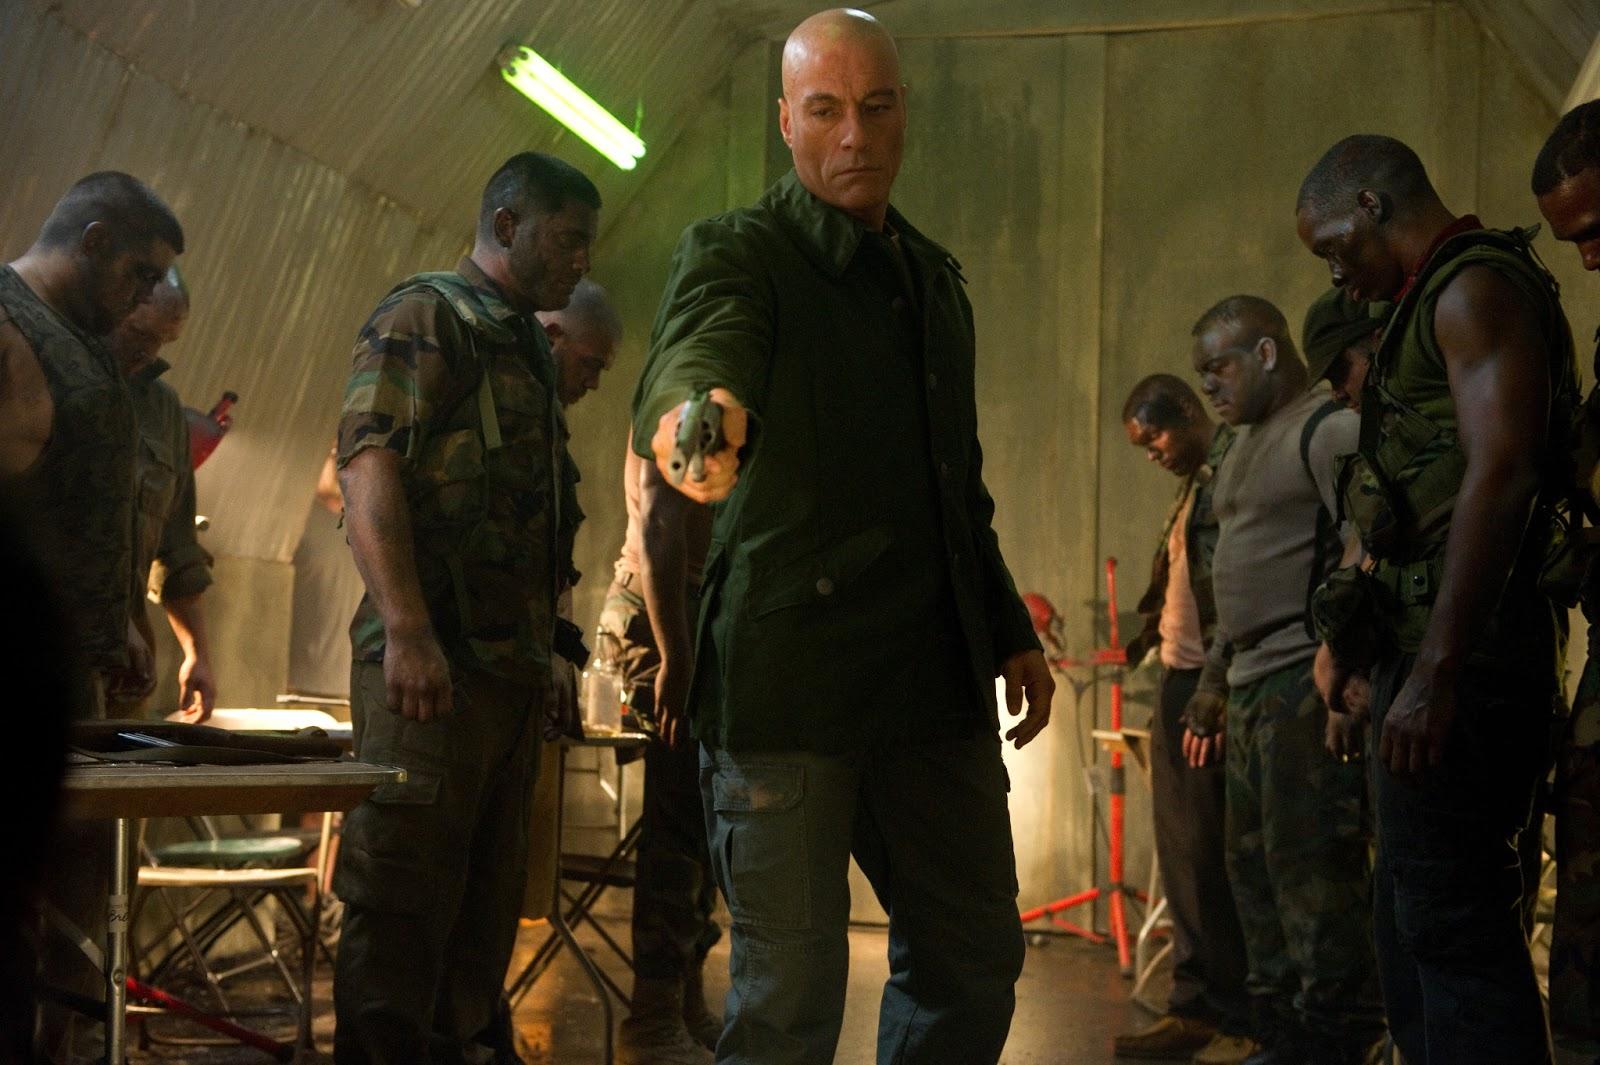 Geektastic Film Reviews: Universal Soldier: Day of Reckoning